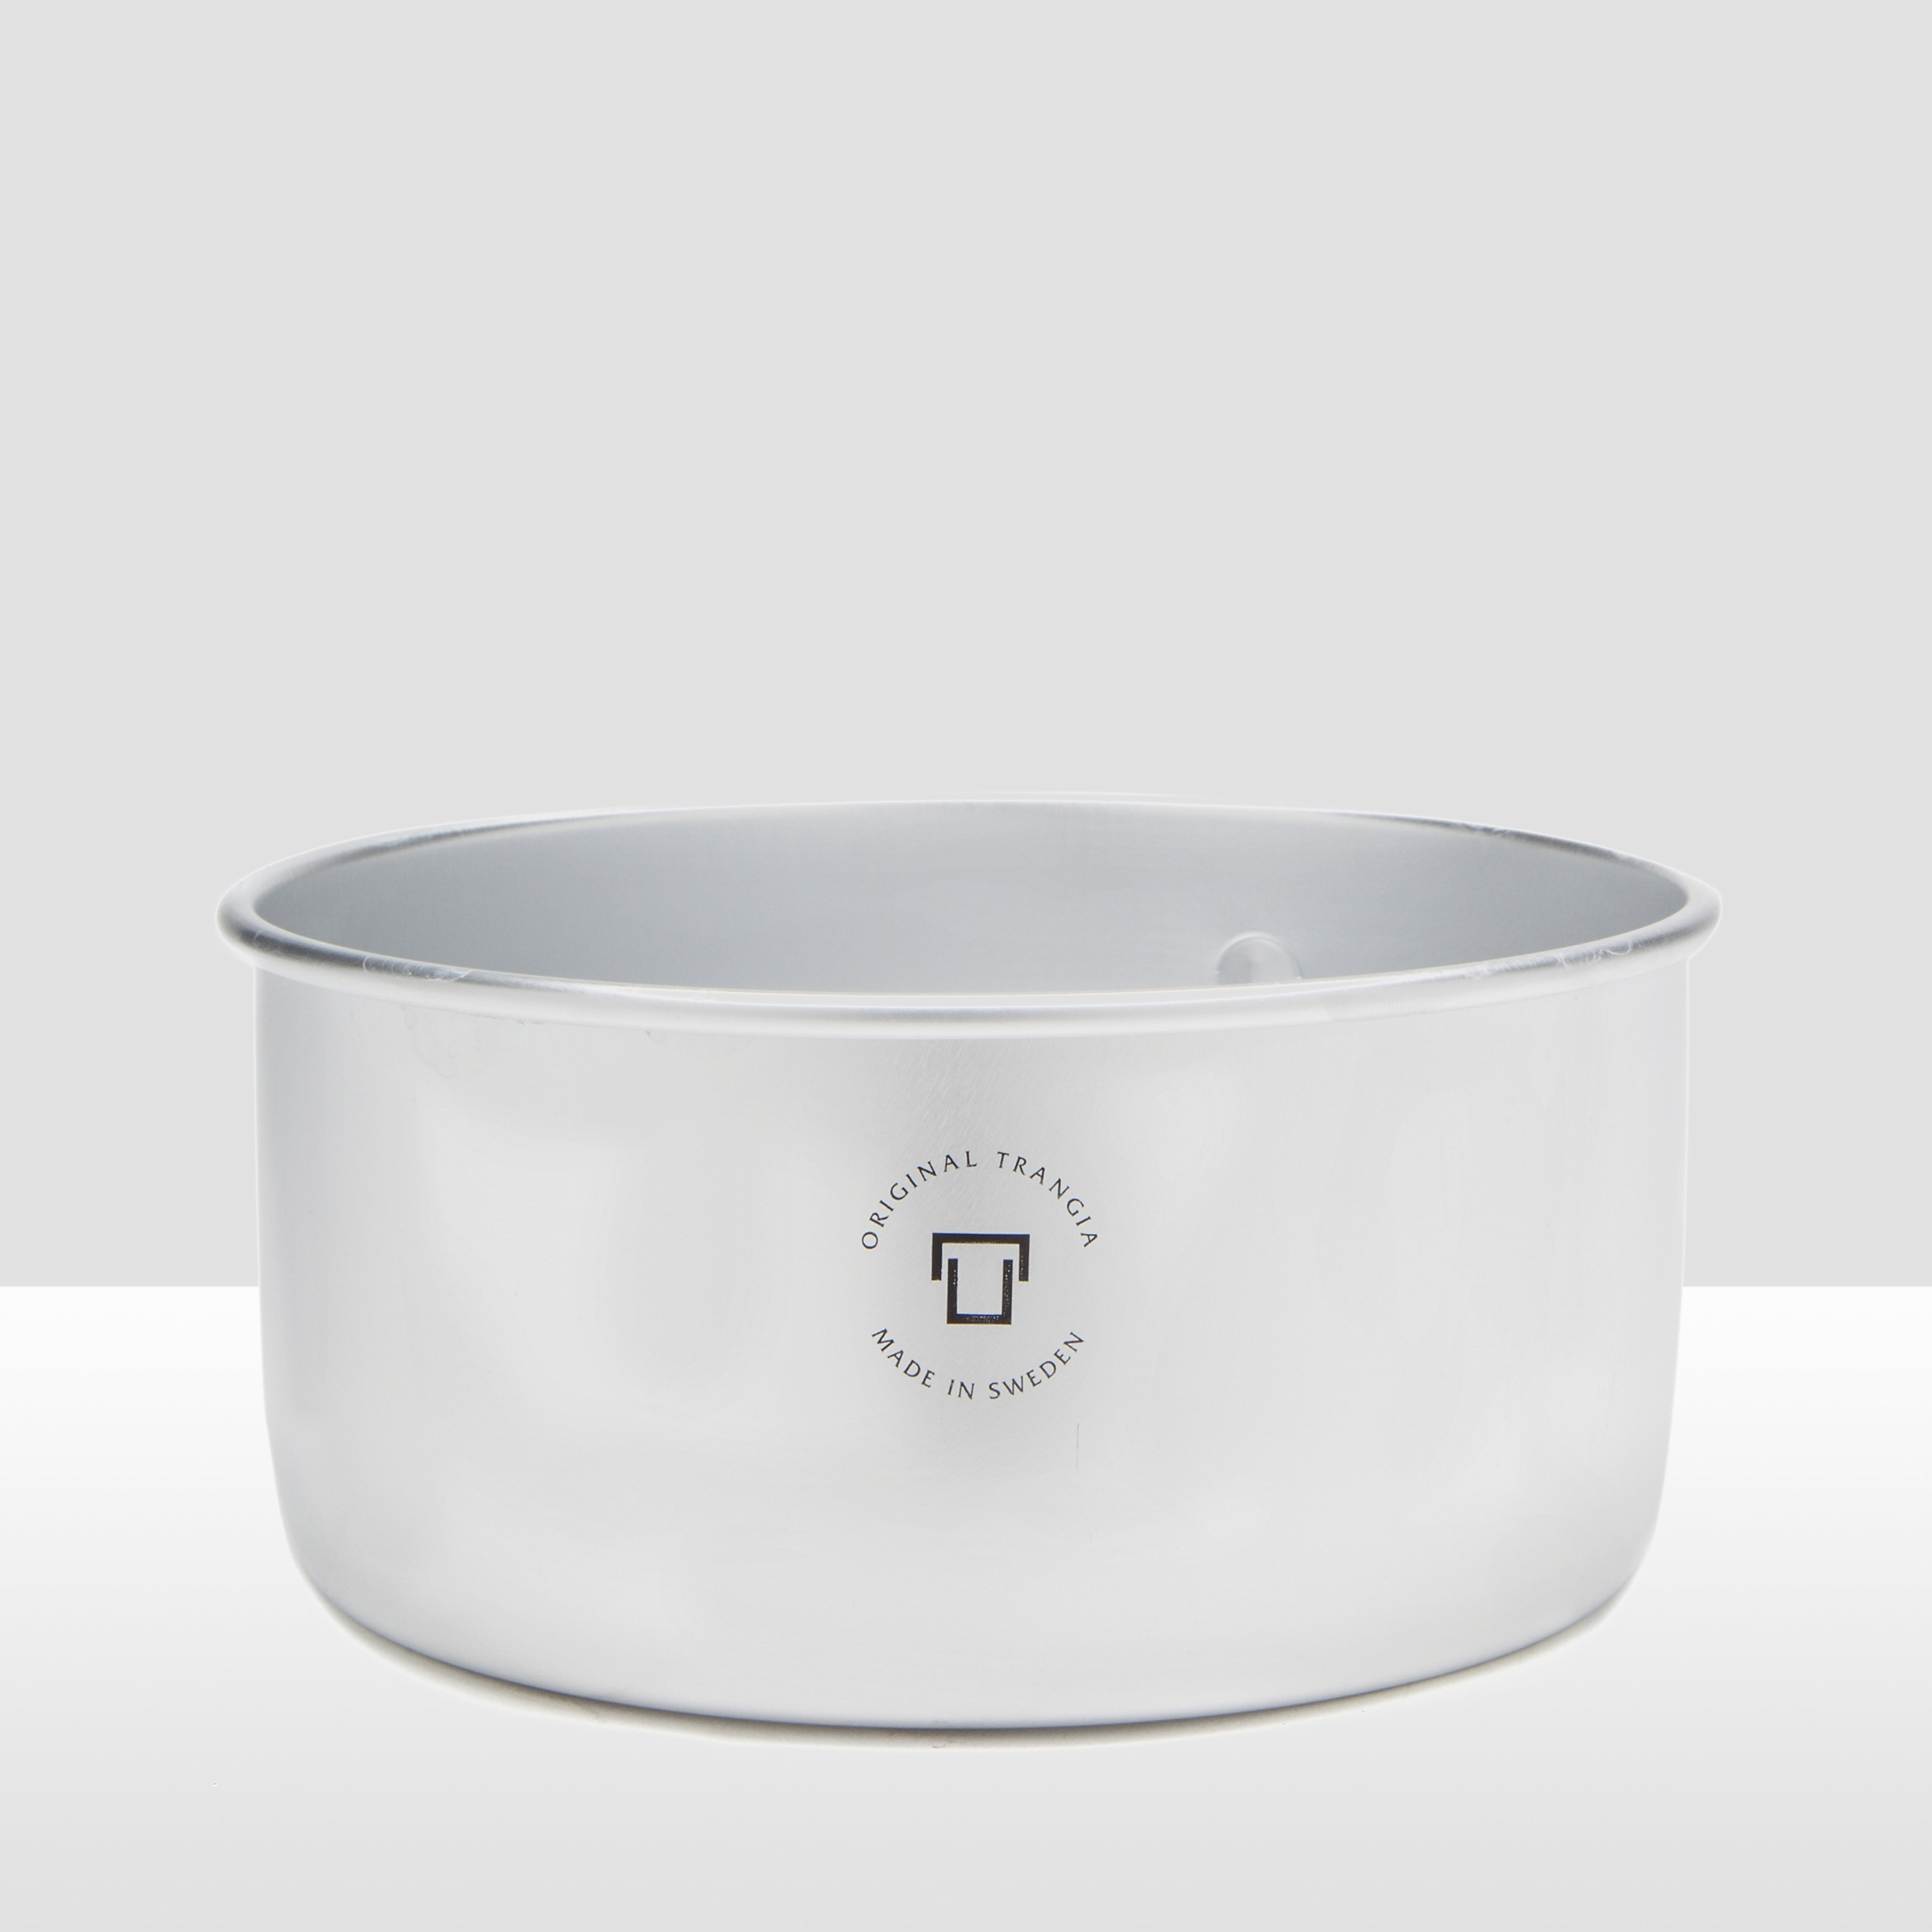 TRANGIA 1.5L Saucepan (25 Series)